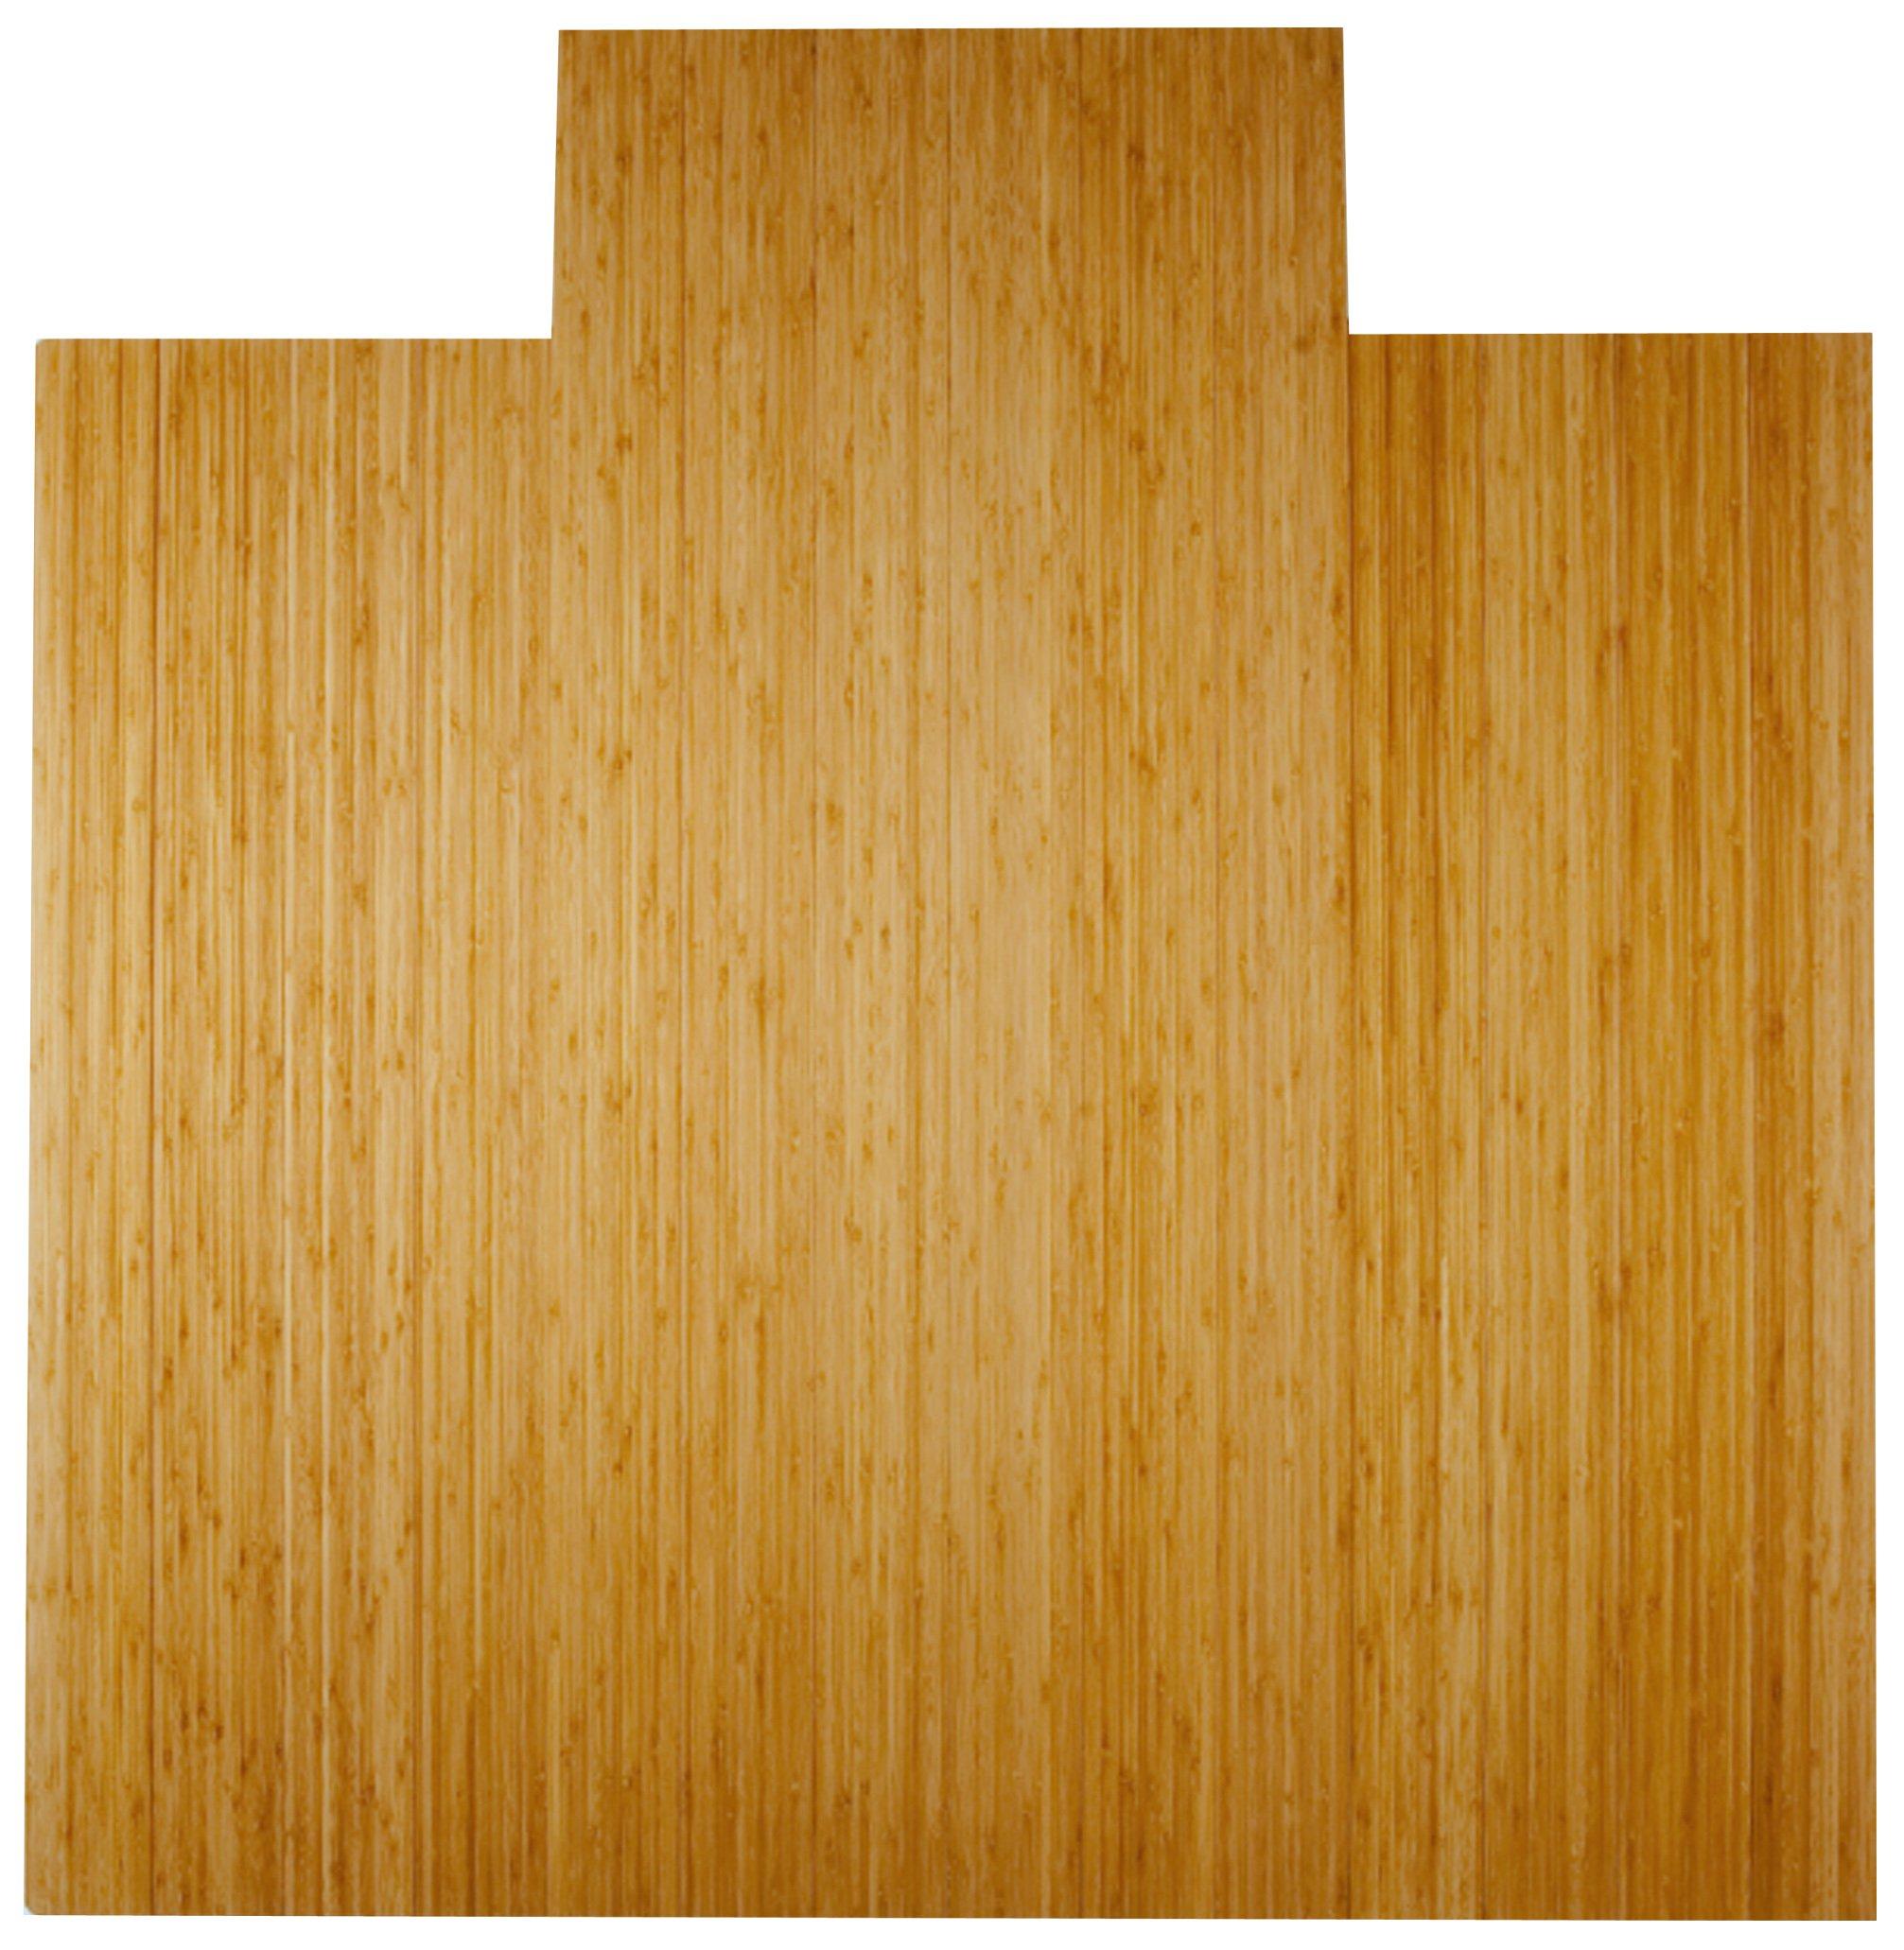 Anji Mountain AMB24024W Real Bamboo Wood Chair Mat, 55 x 57, Natural